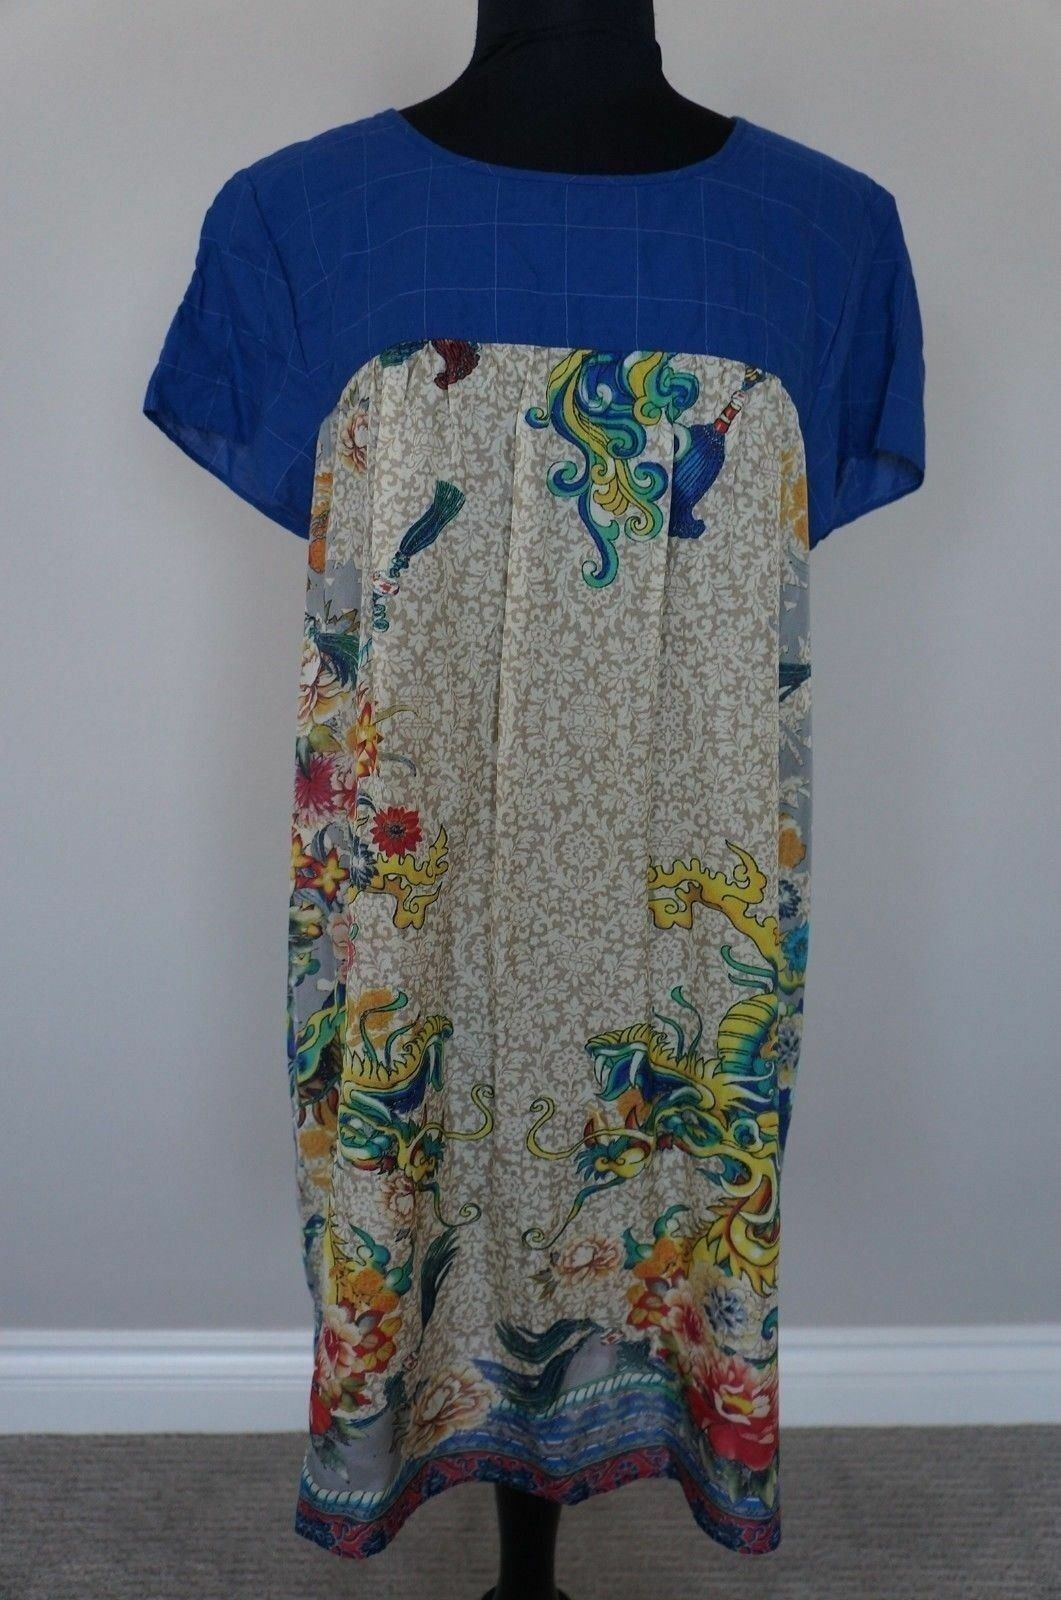 NEW Johnny Was 3J Silk Print & Plaid Yuki Peasant Tunic Top Blouse Dress S